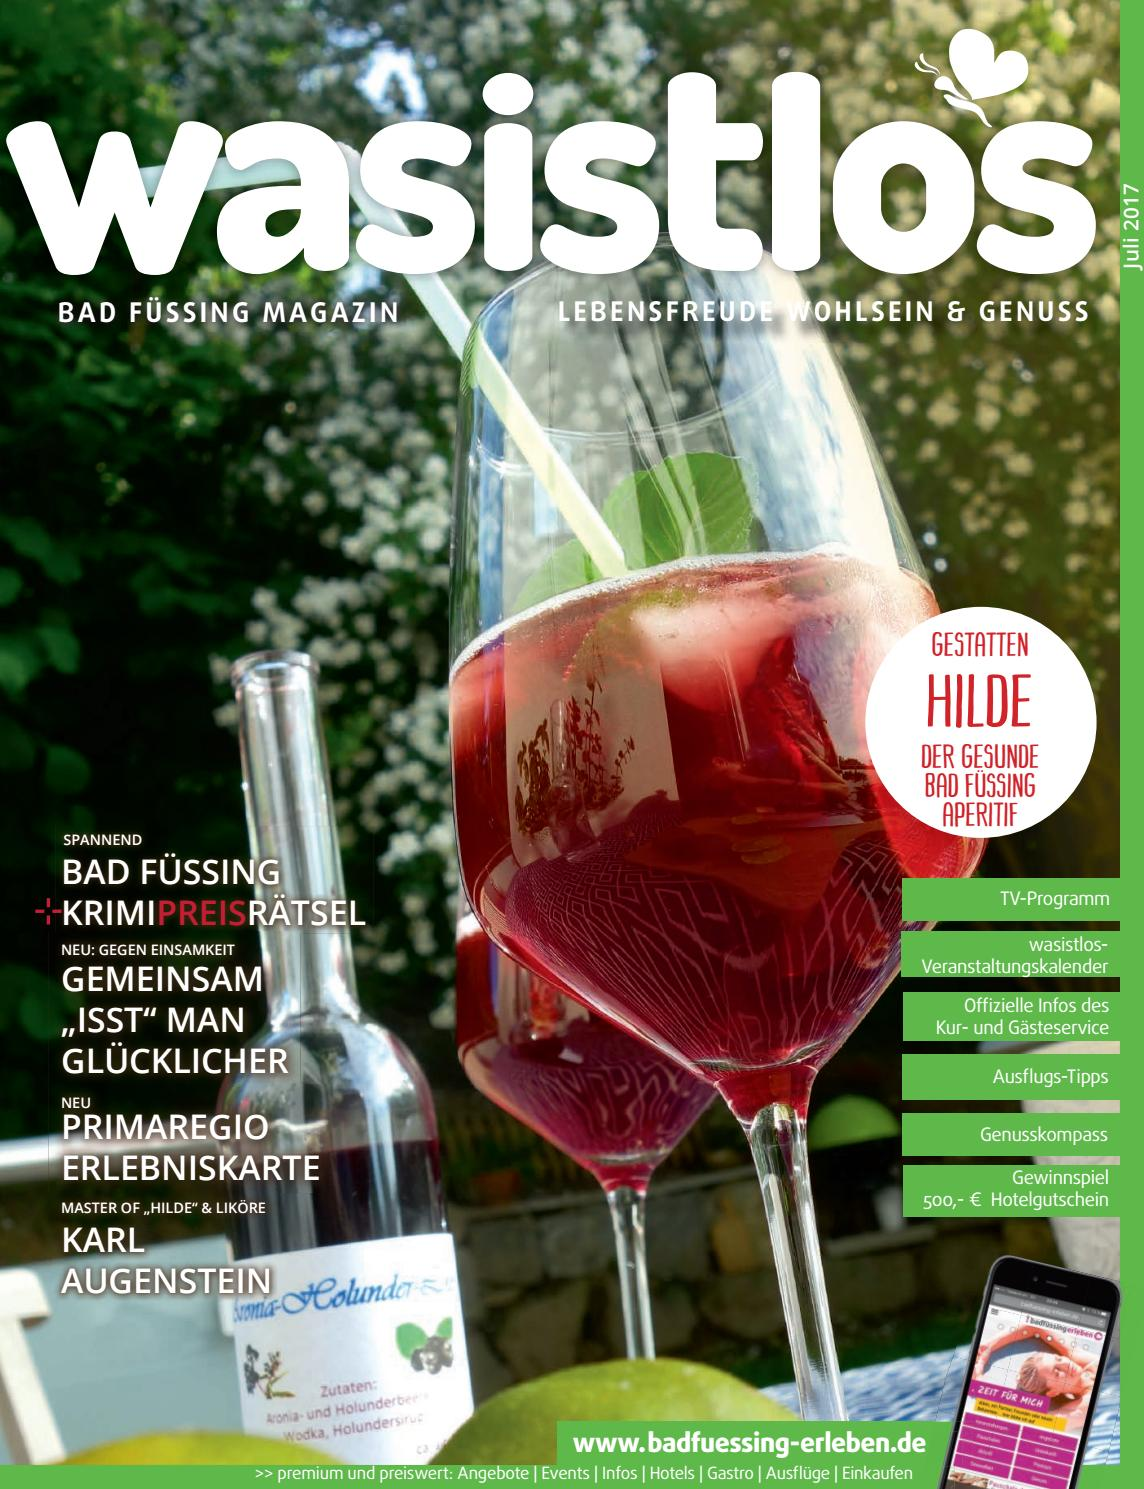 Wasistlos Bad Fuessing Magazin Juli 2017 By Remark Marketing